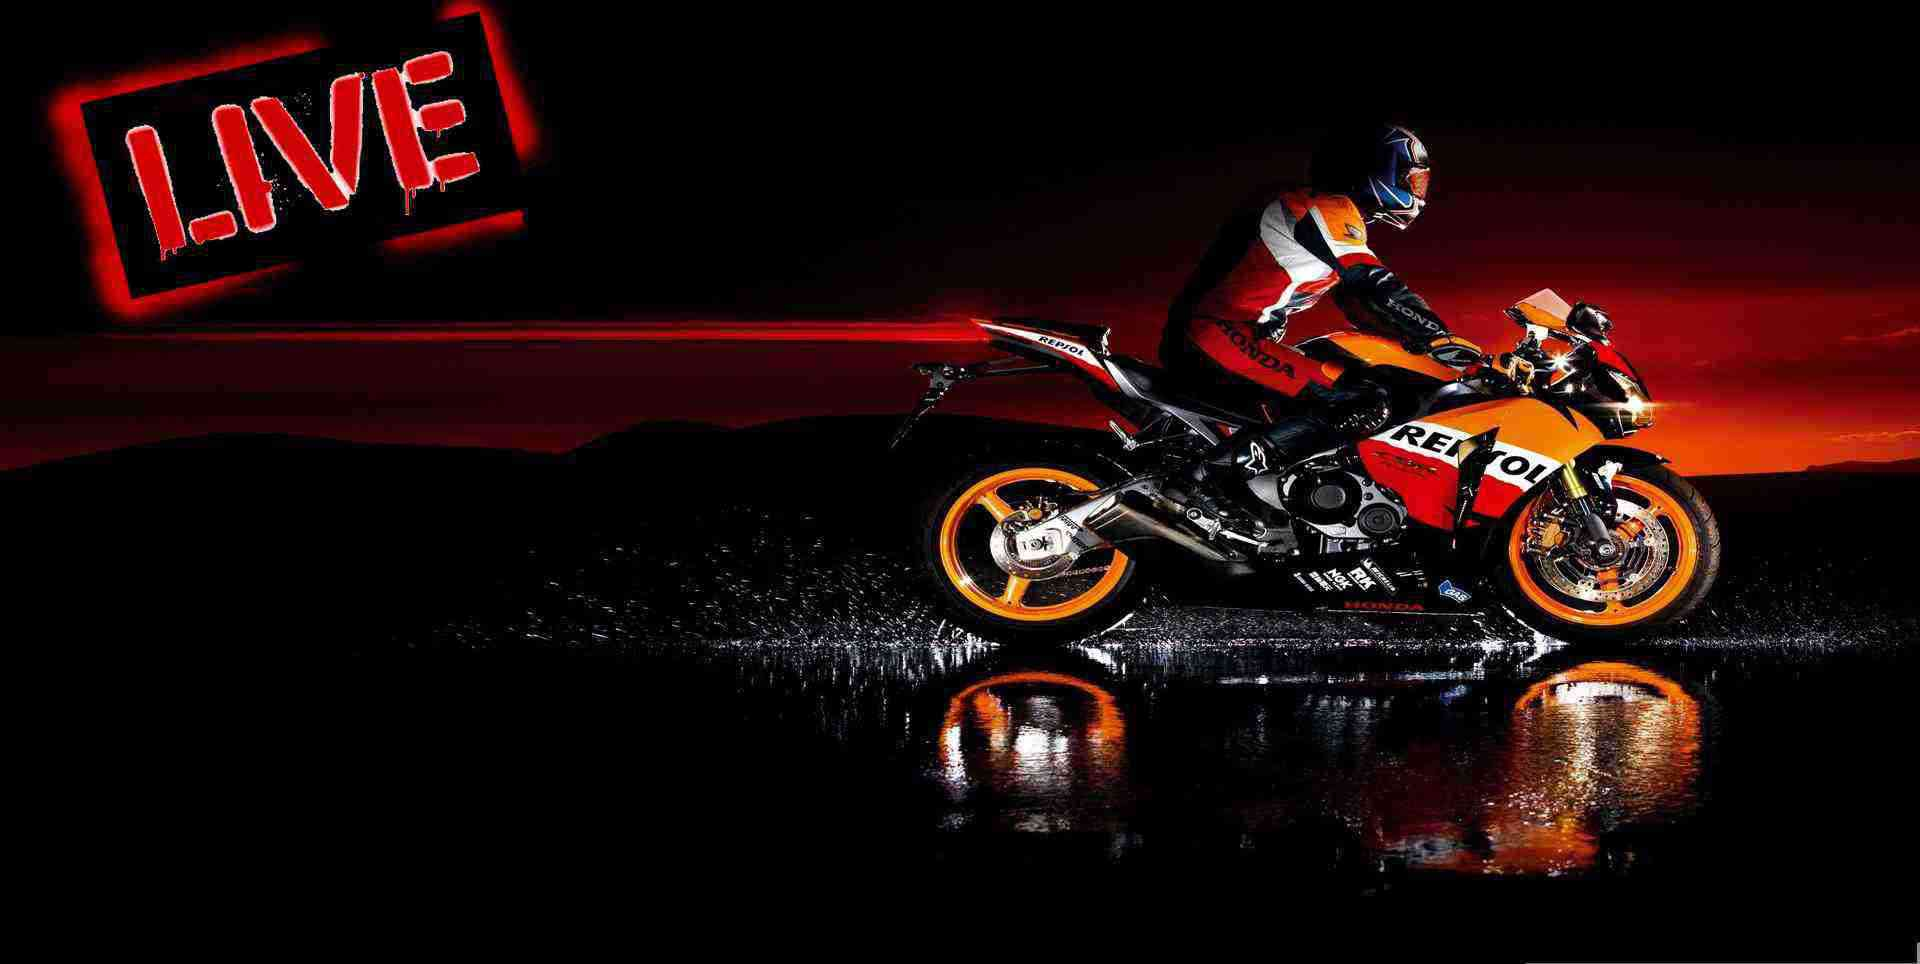 motogp-austrian-grand-prix-2018-live